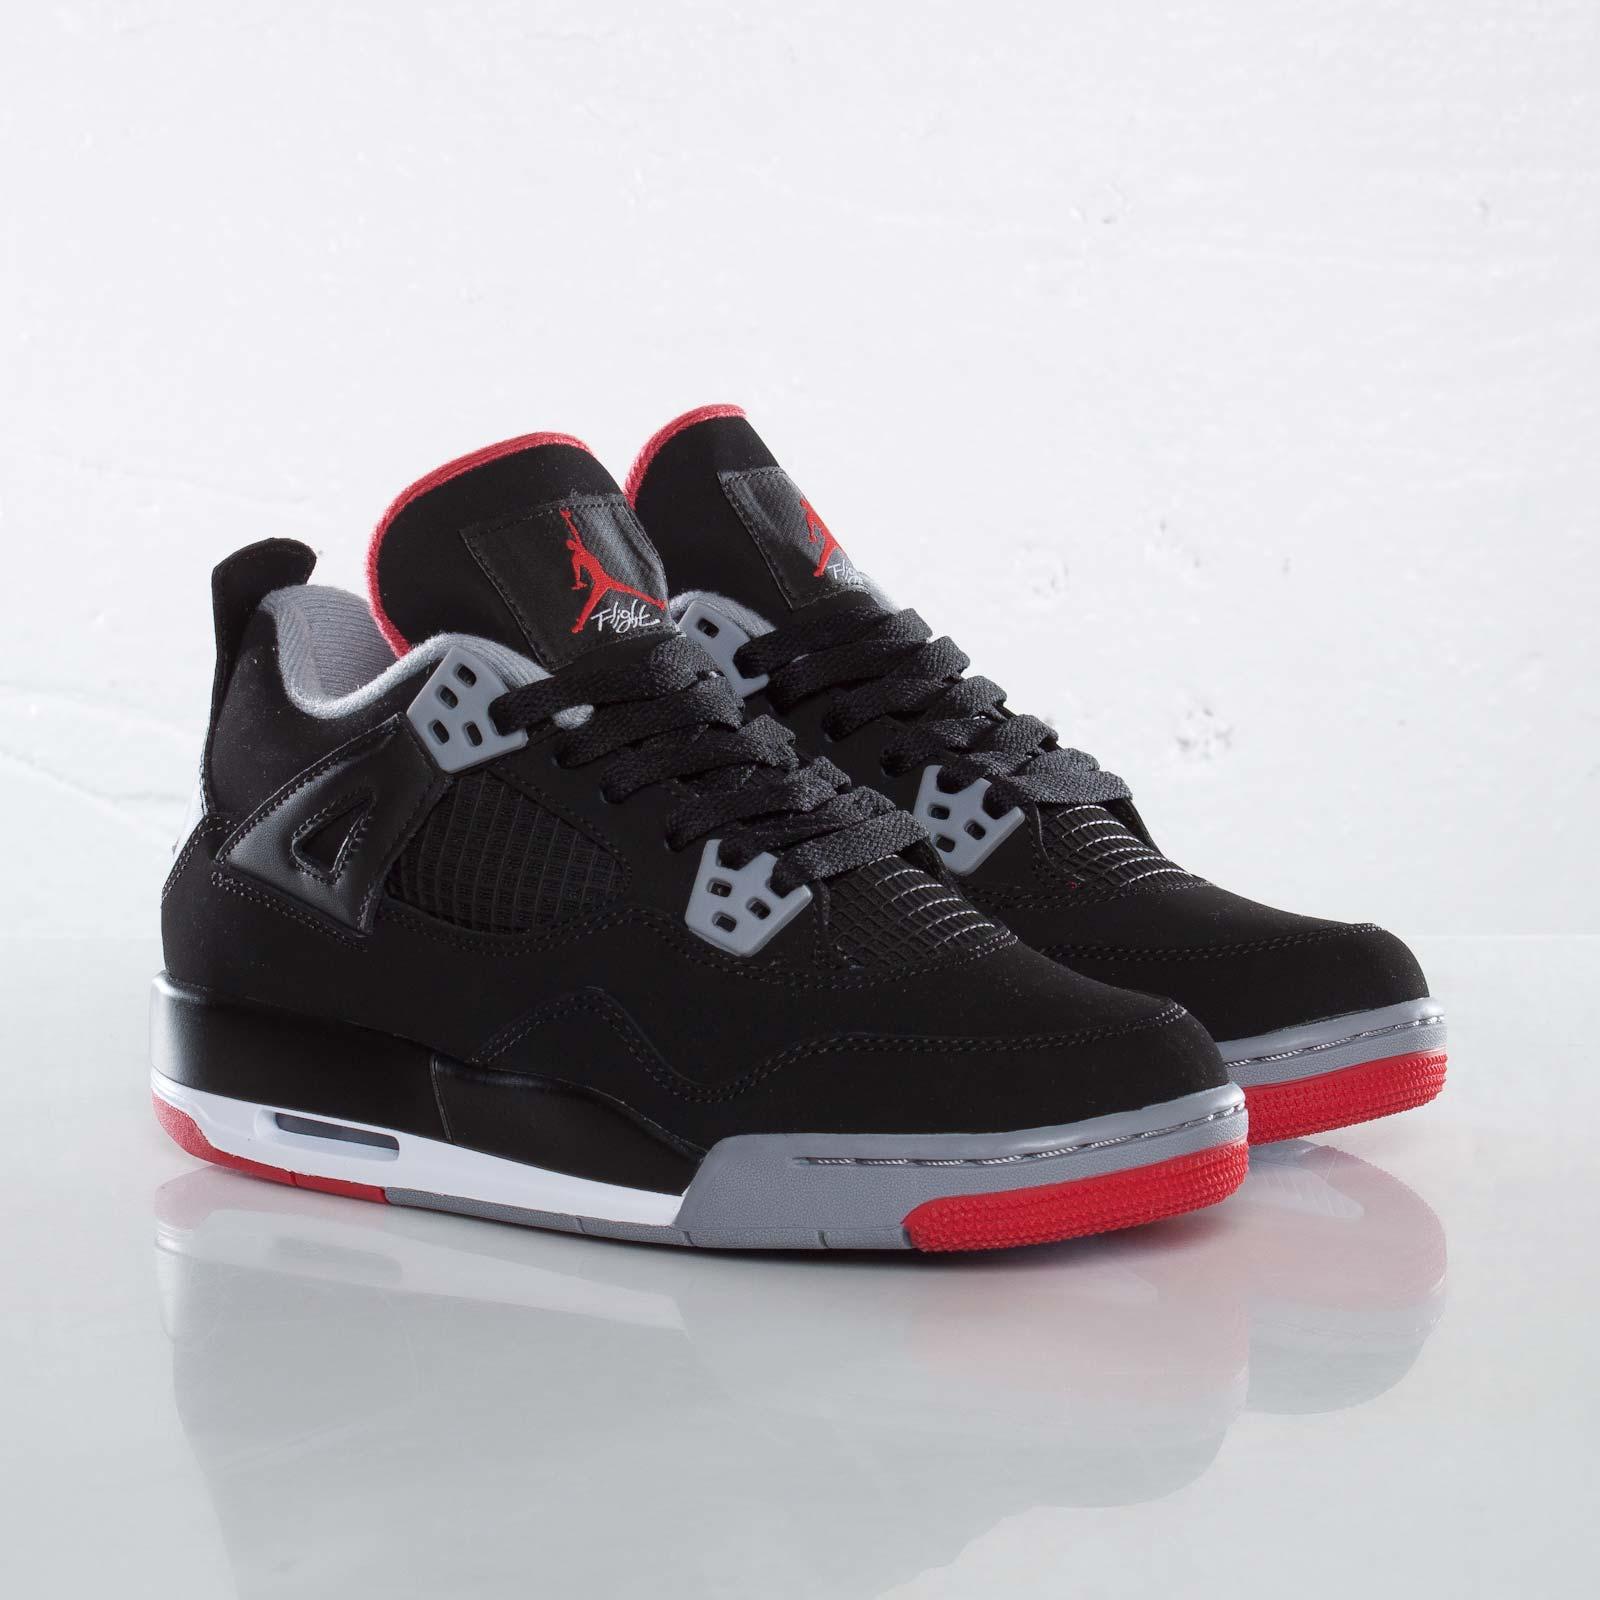 super cute 46c5e 3a994 Jordan Brand Air Jordan 4 Retro (GS)